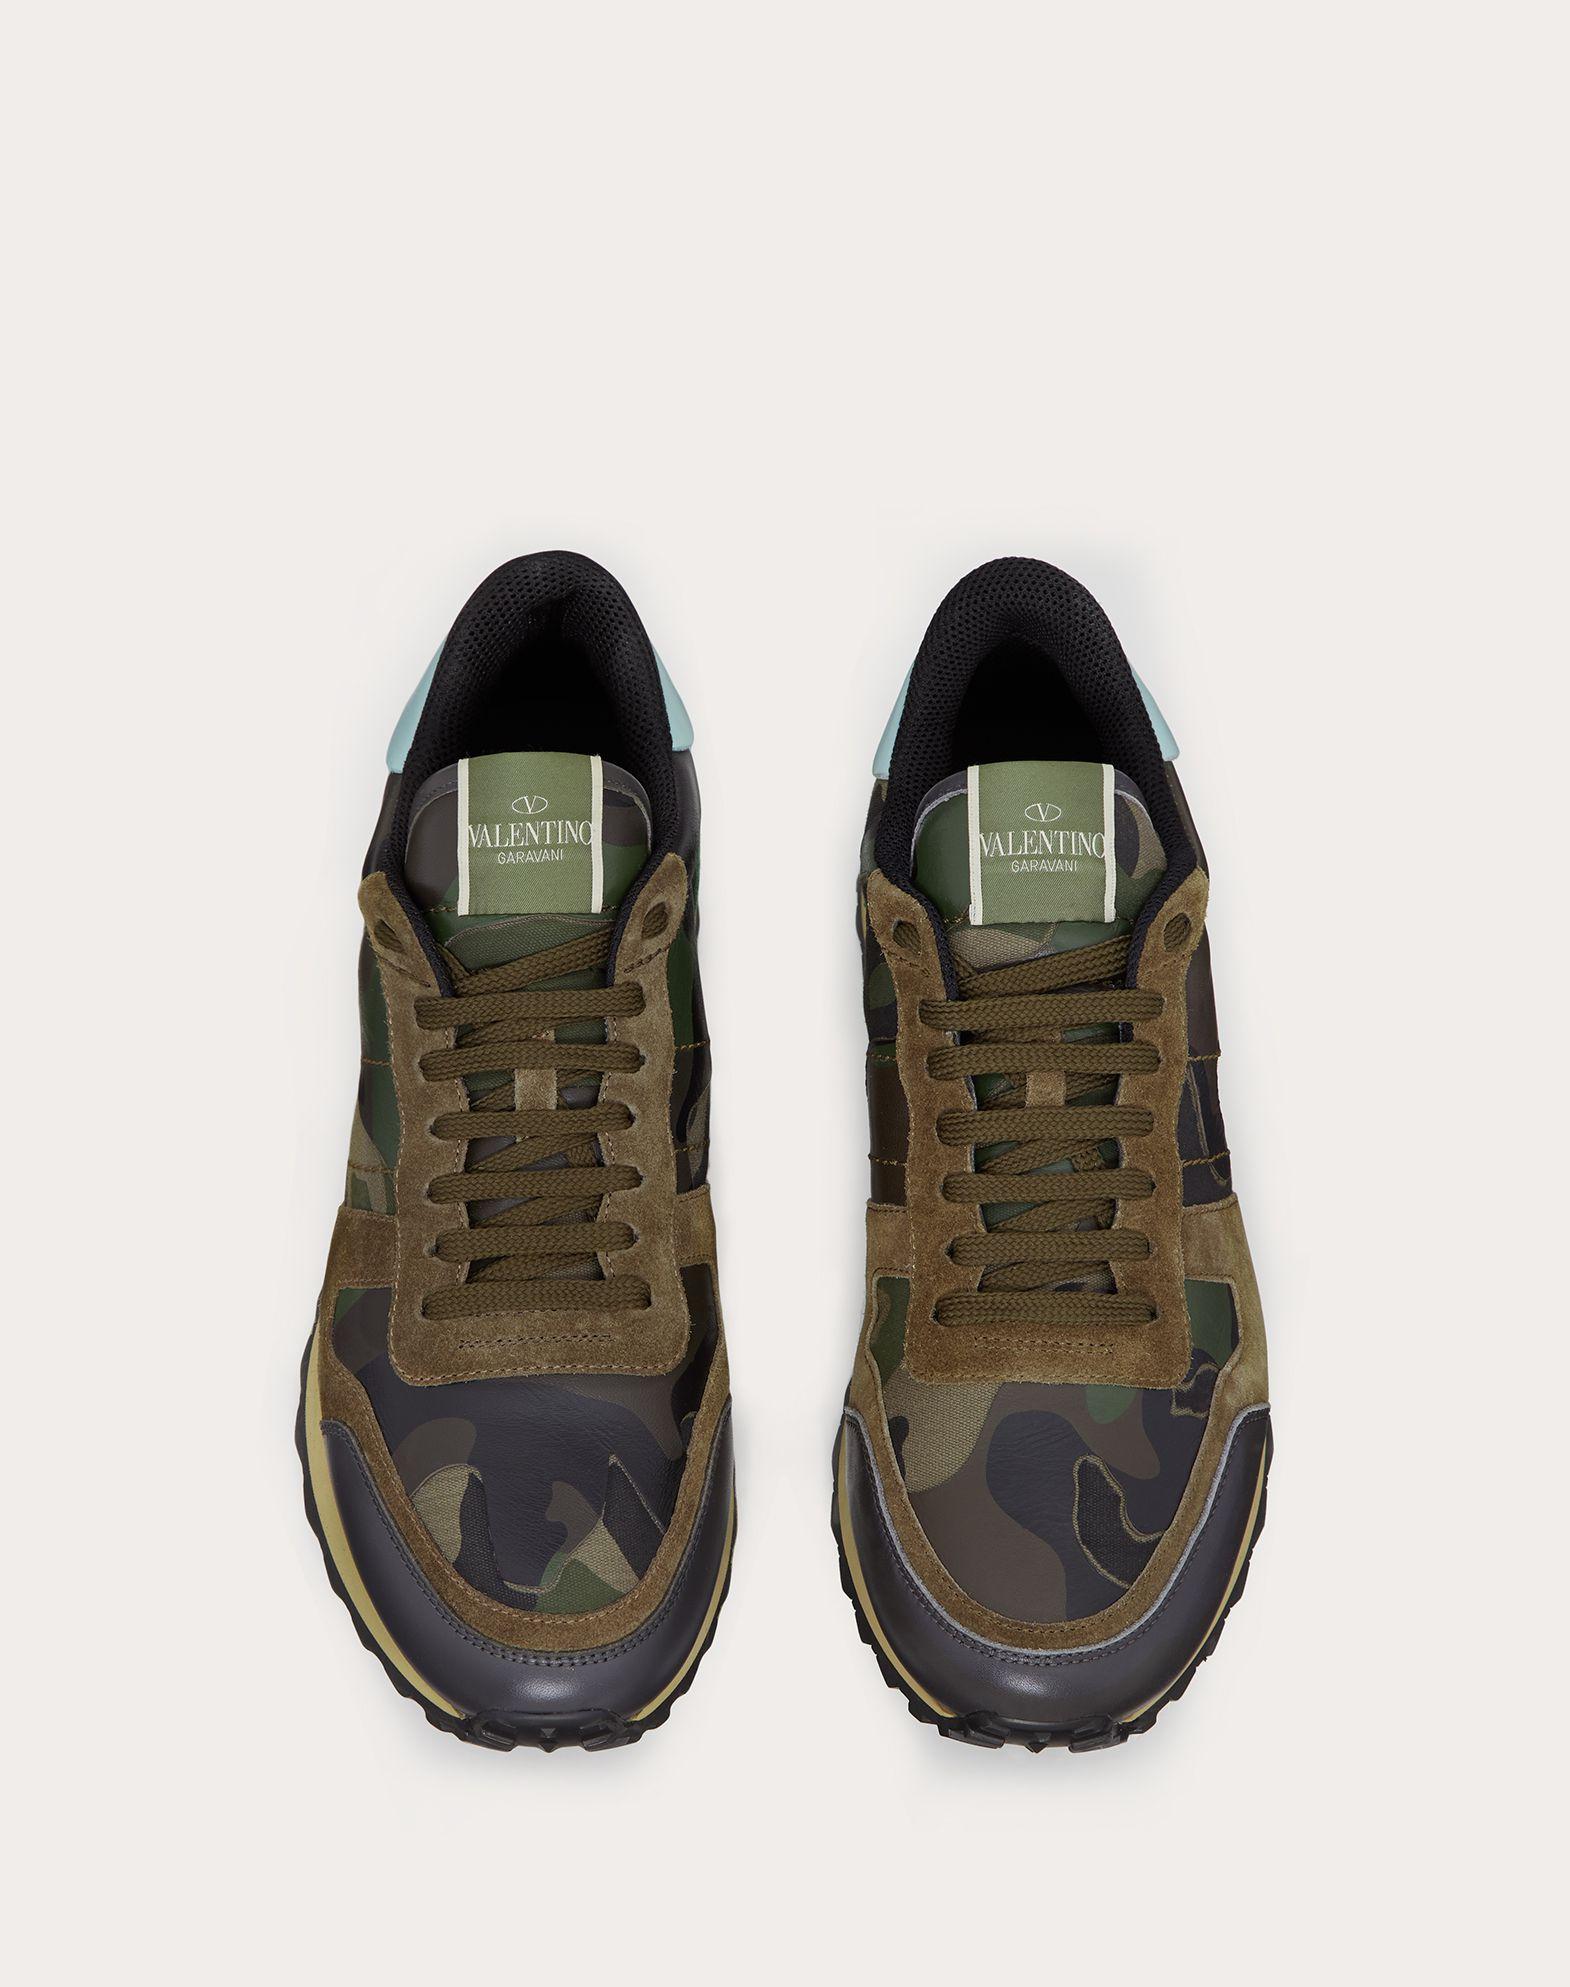 VALENTINO GARAVANI UOMO Sneaker Rockrunner Camouflage LOW-TOP SNEAKERS U e